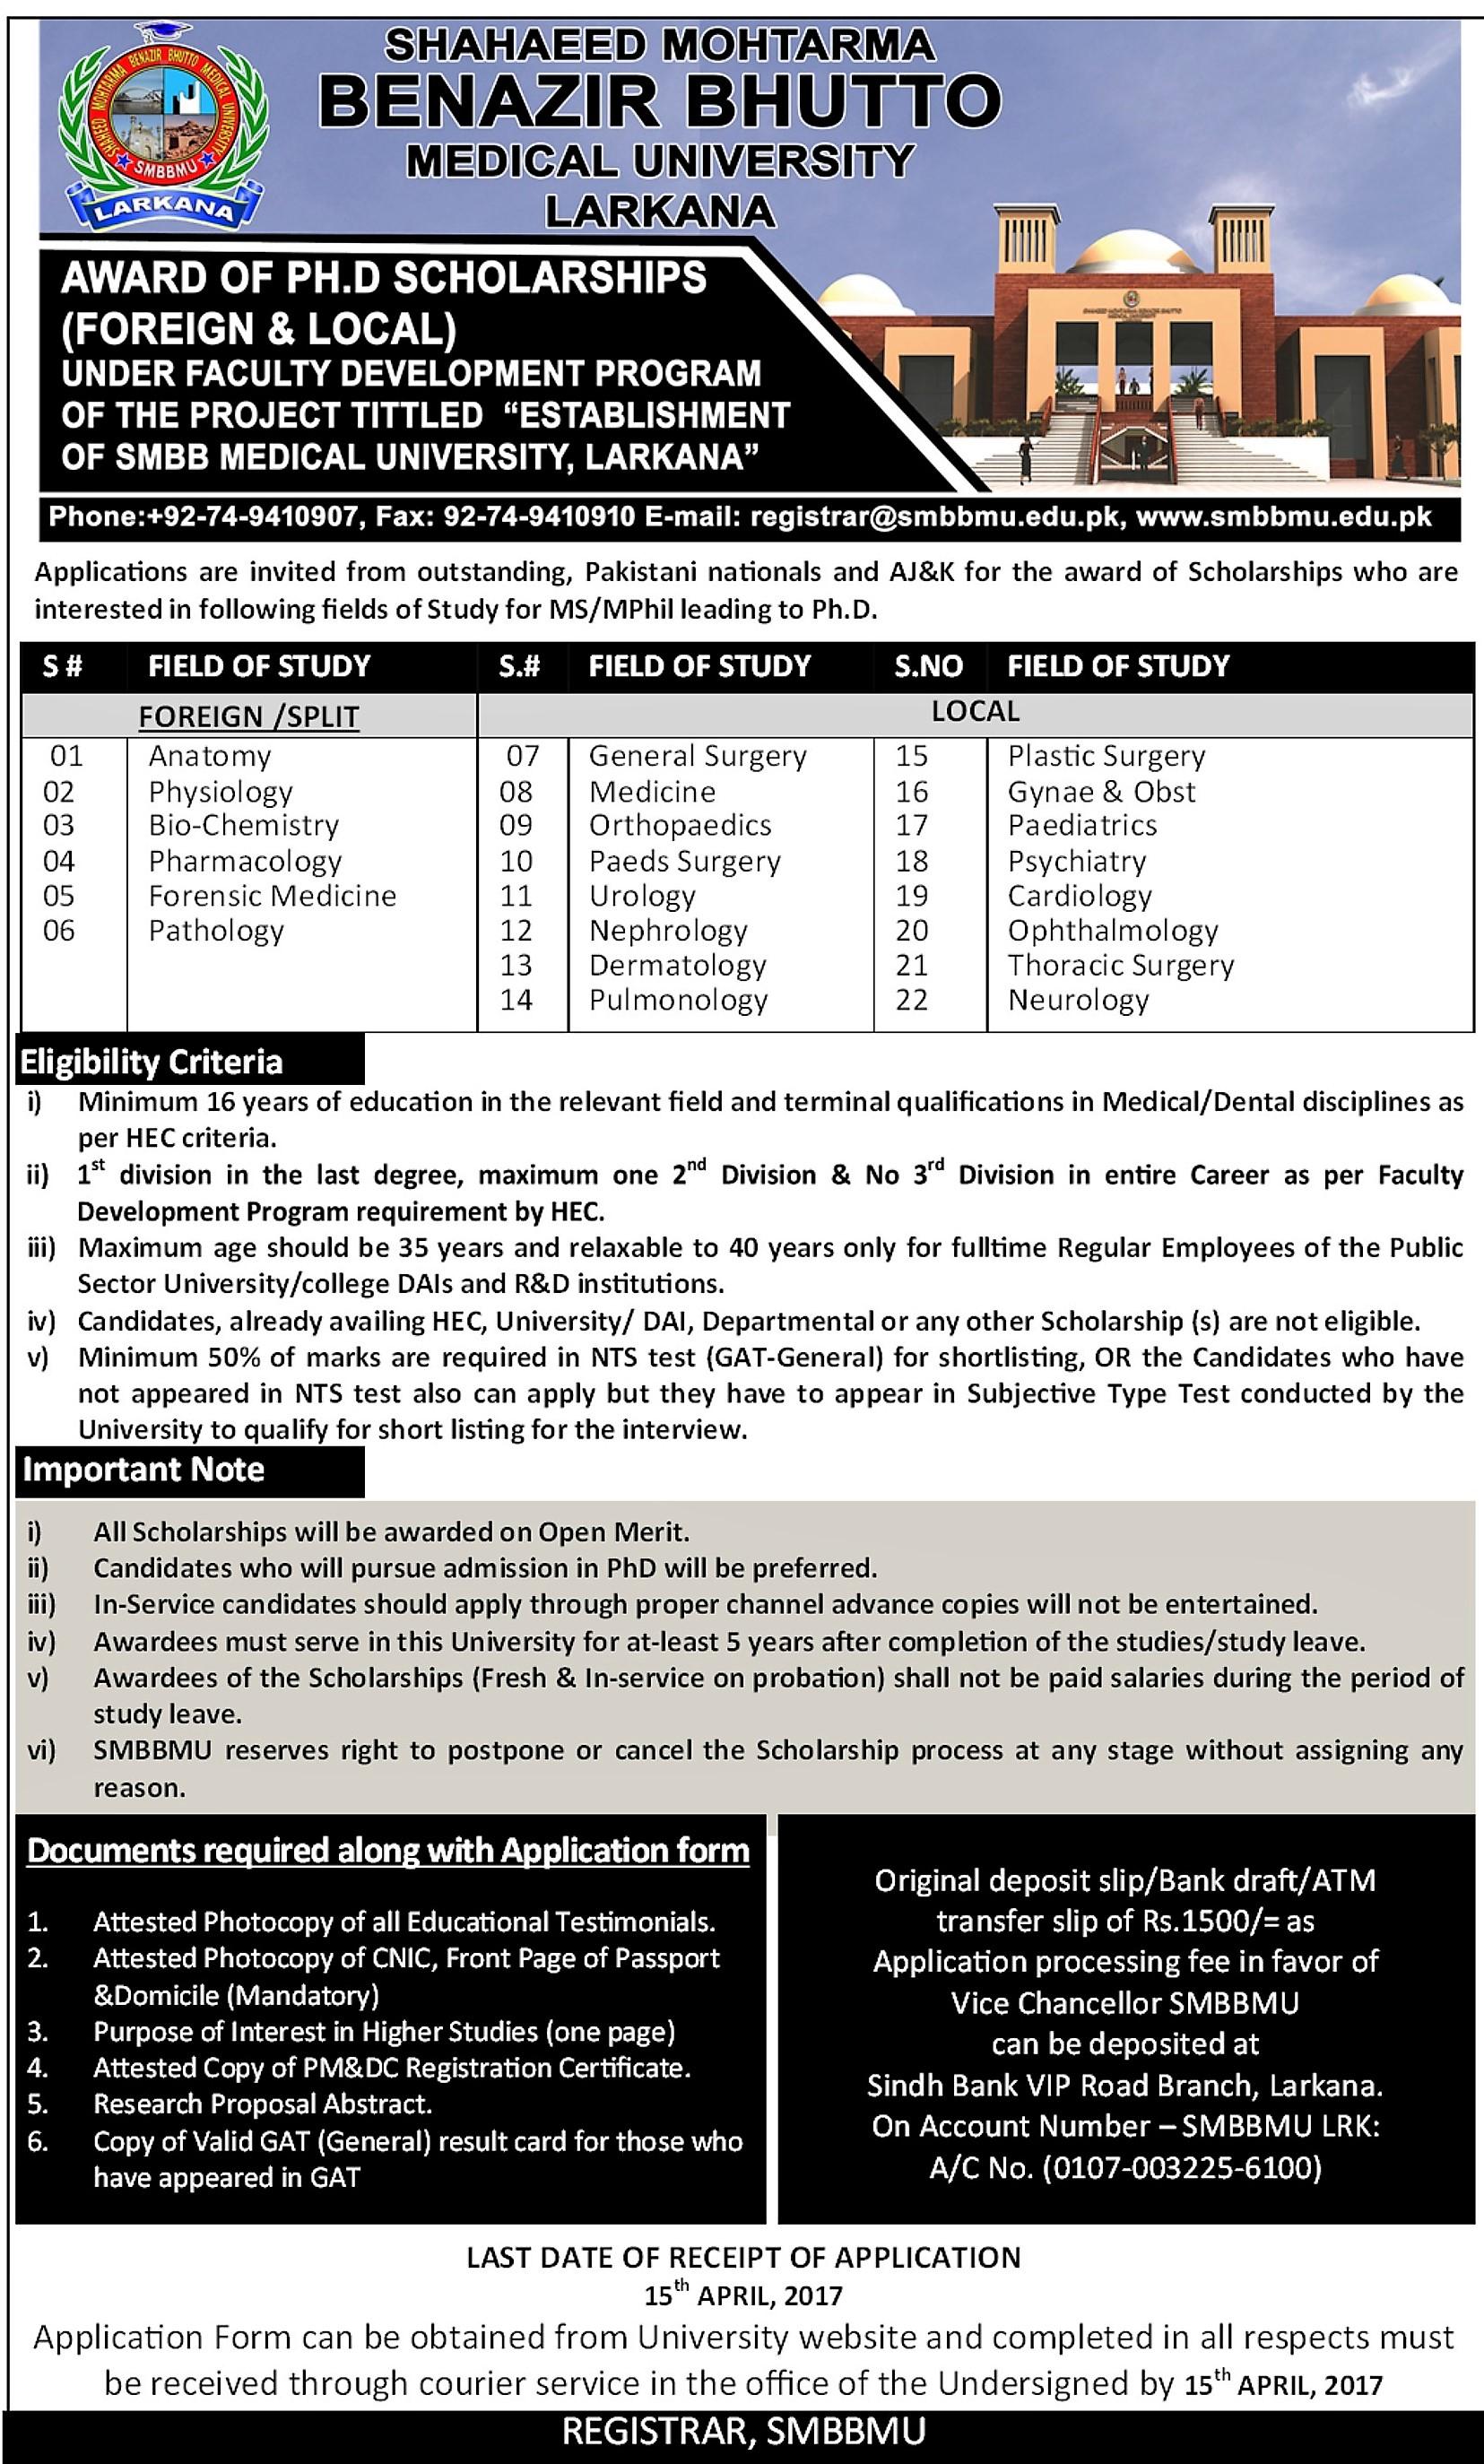 Shaheed Mohtarma Benazir Bhutto Medical University